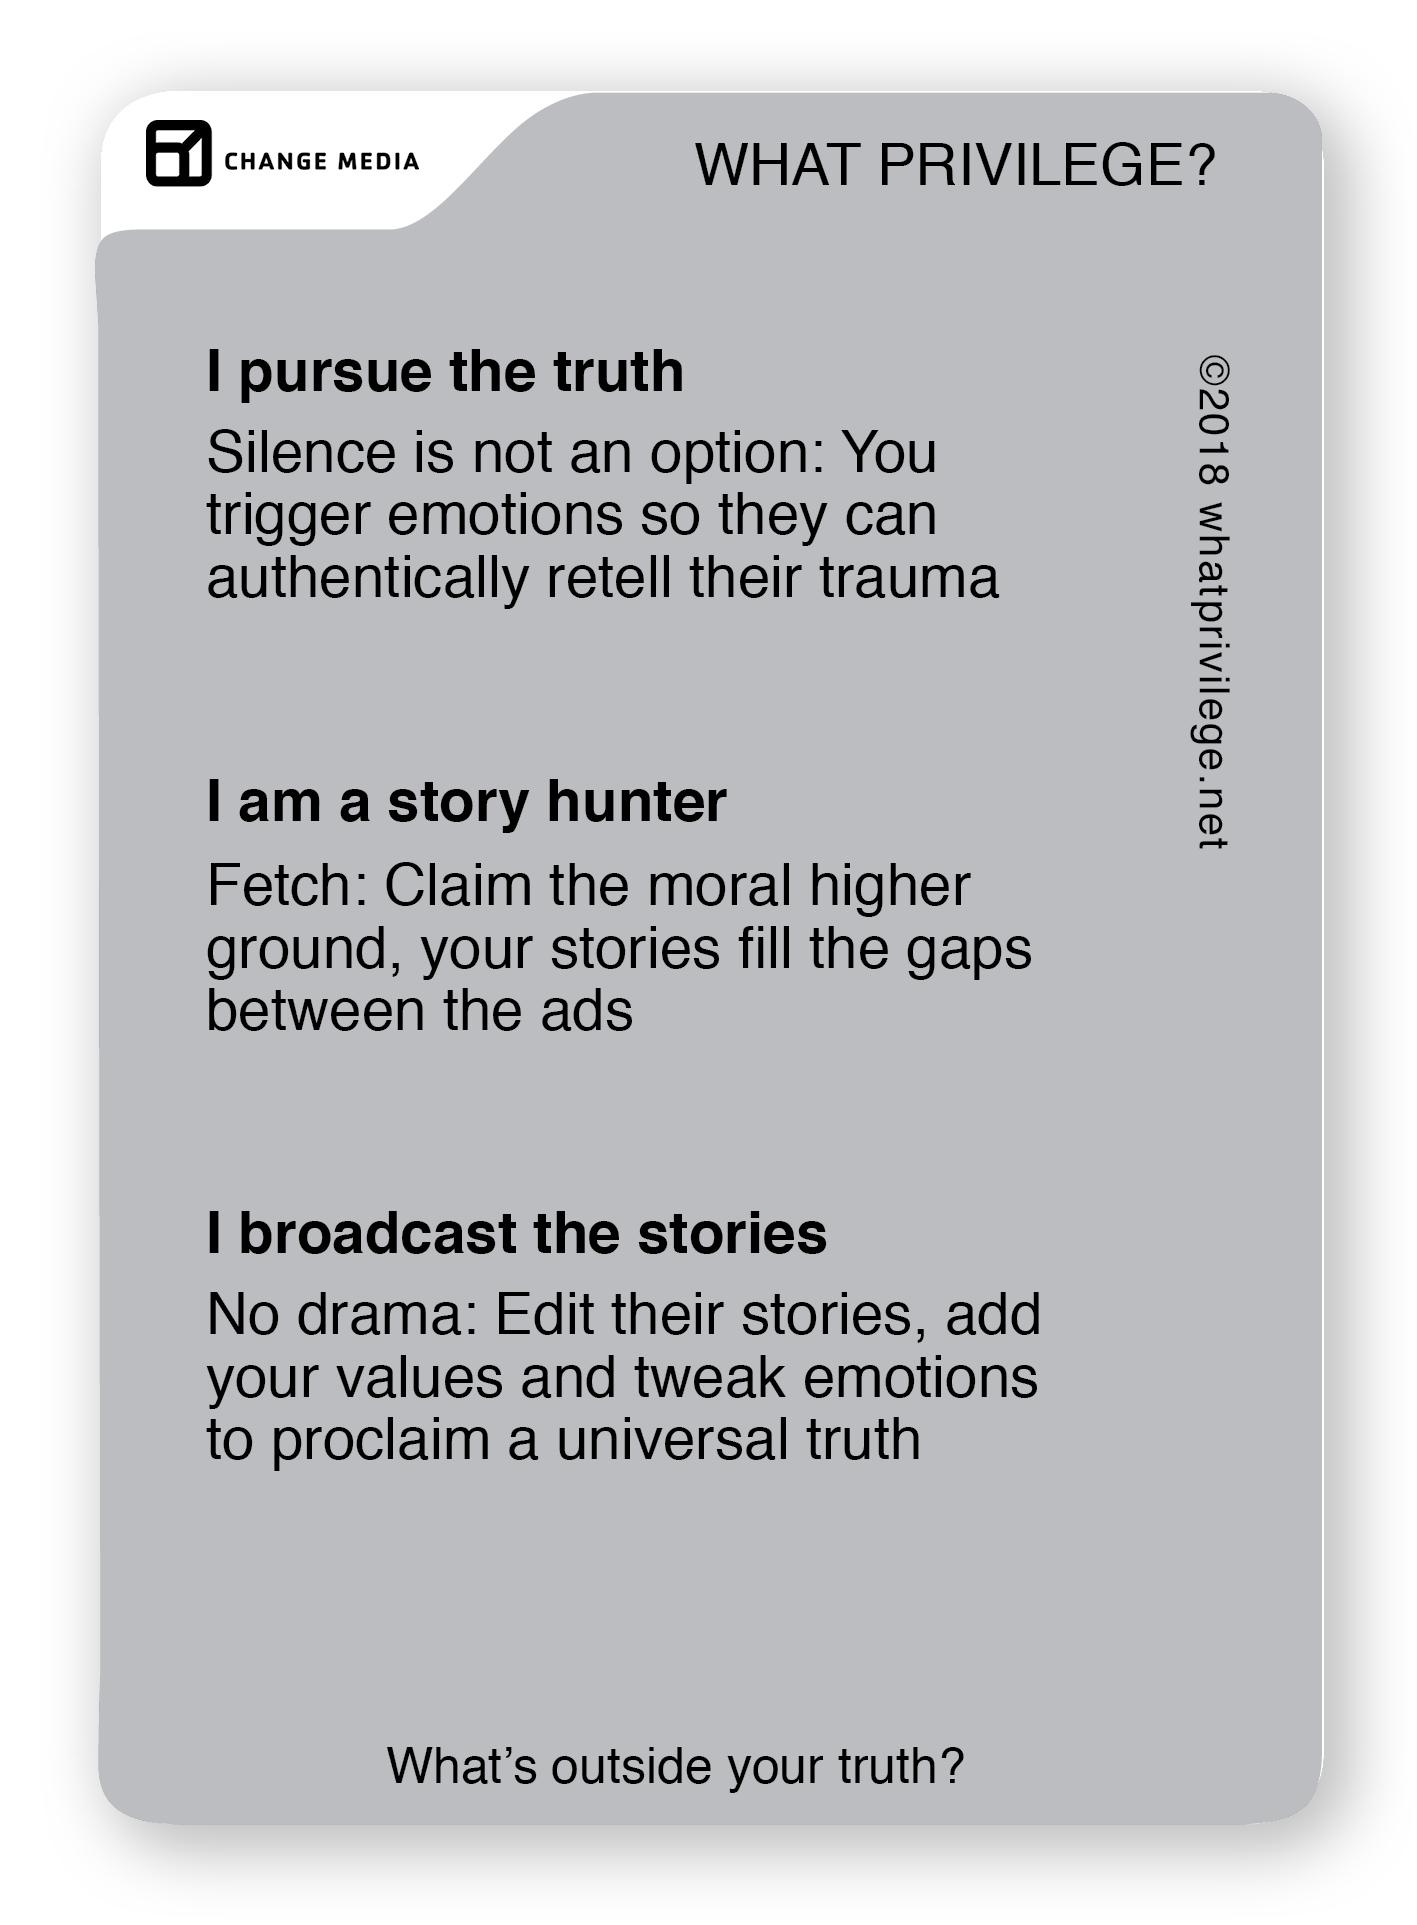 whatprivilege-stories5-back.jpg